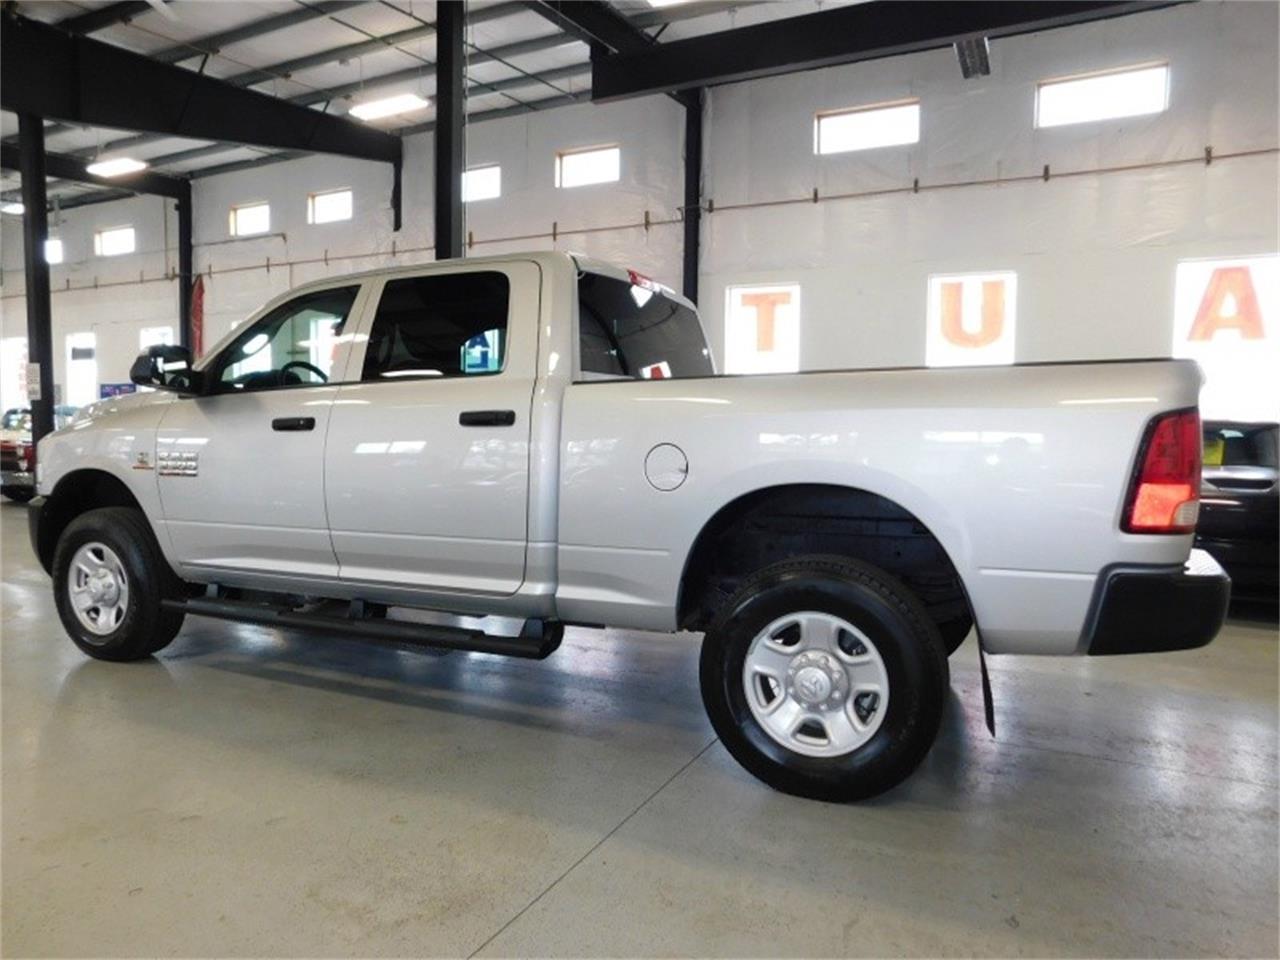 2017 Dodge Ram (CC-1229350) for sale in Bend, Oregon